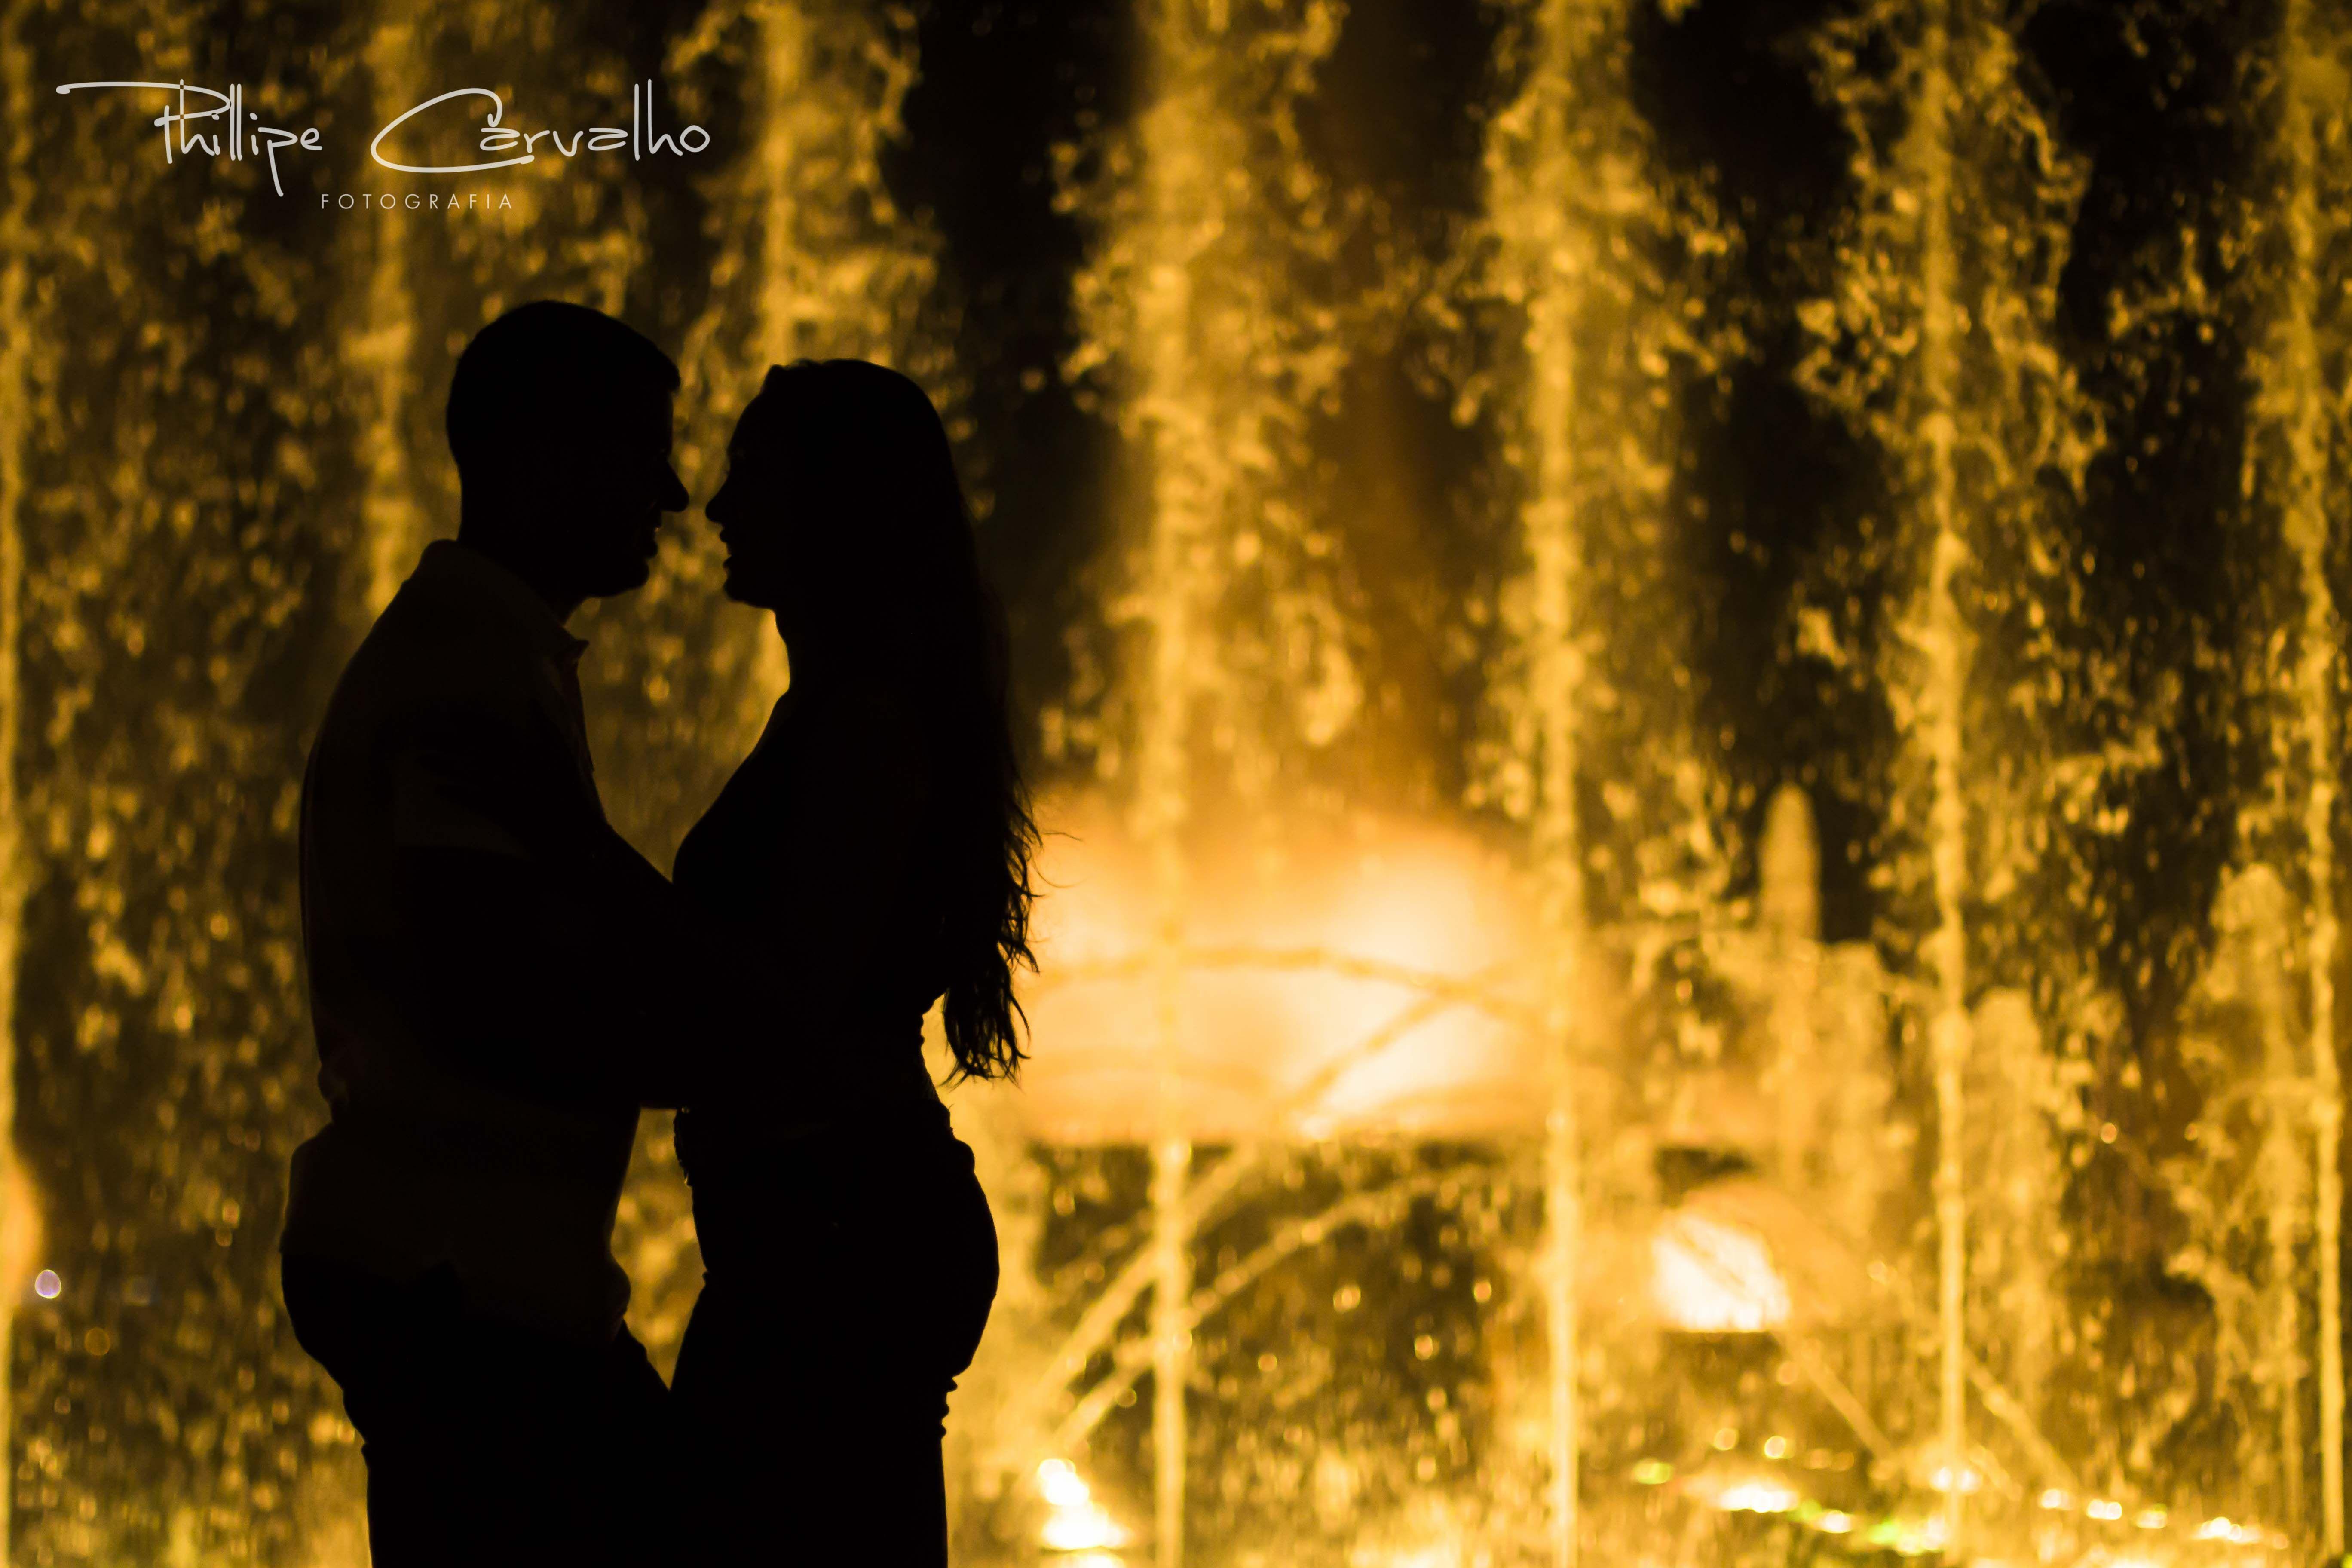 #prewedding #photography #love #phillipecarvalhofoto #ensaioromantico #wedding #silhueta